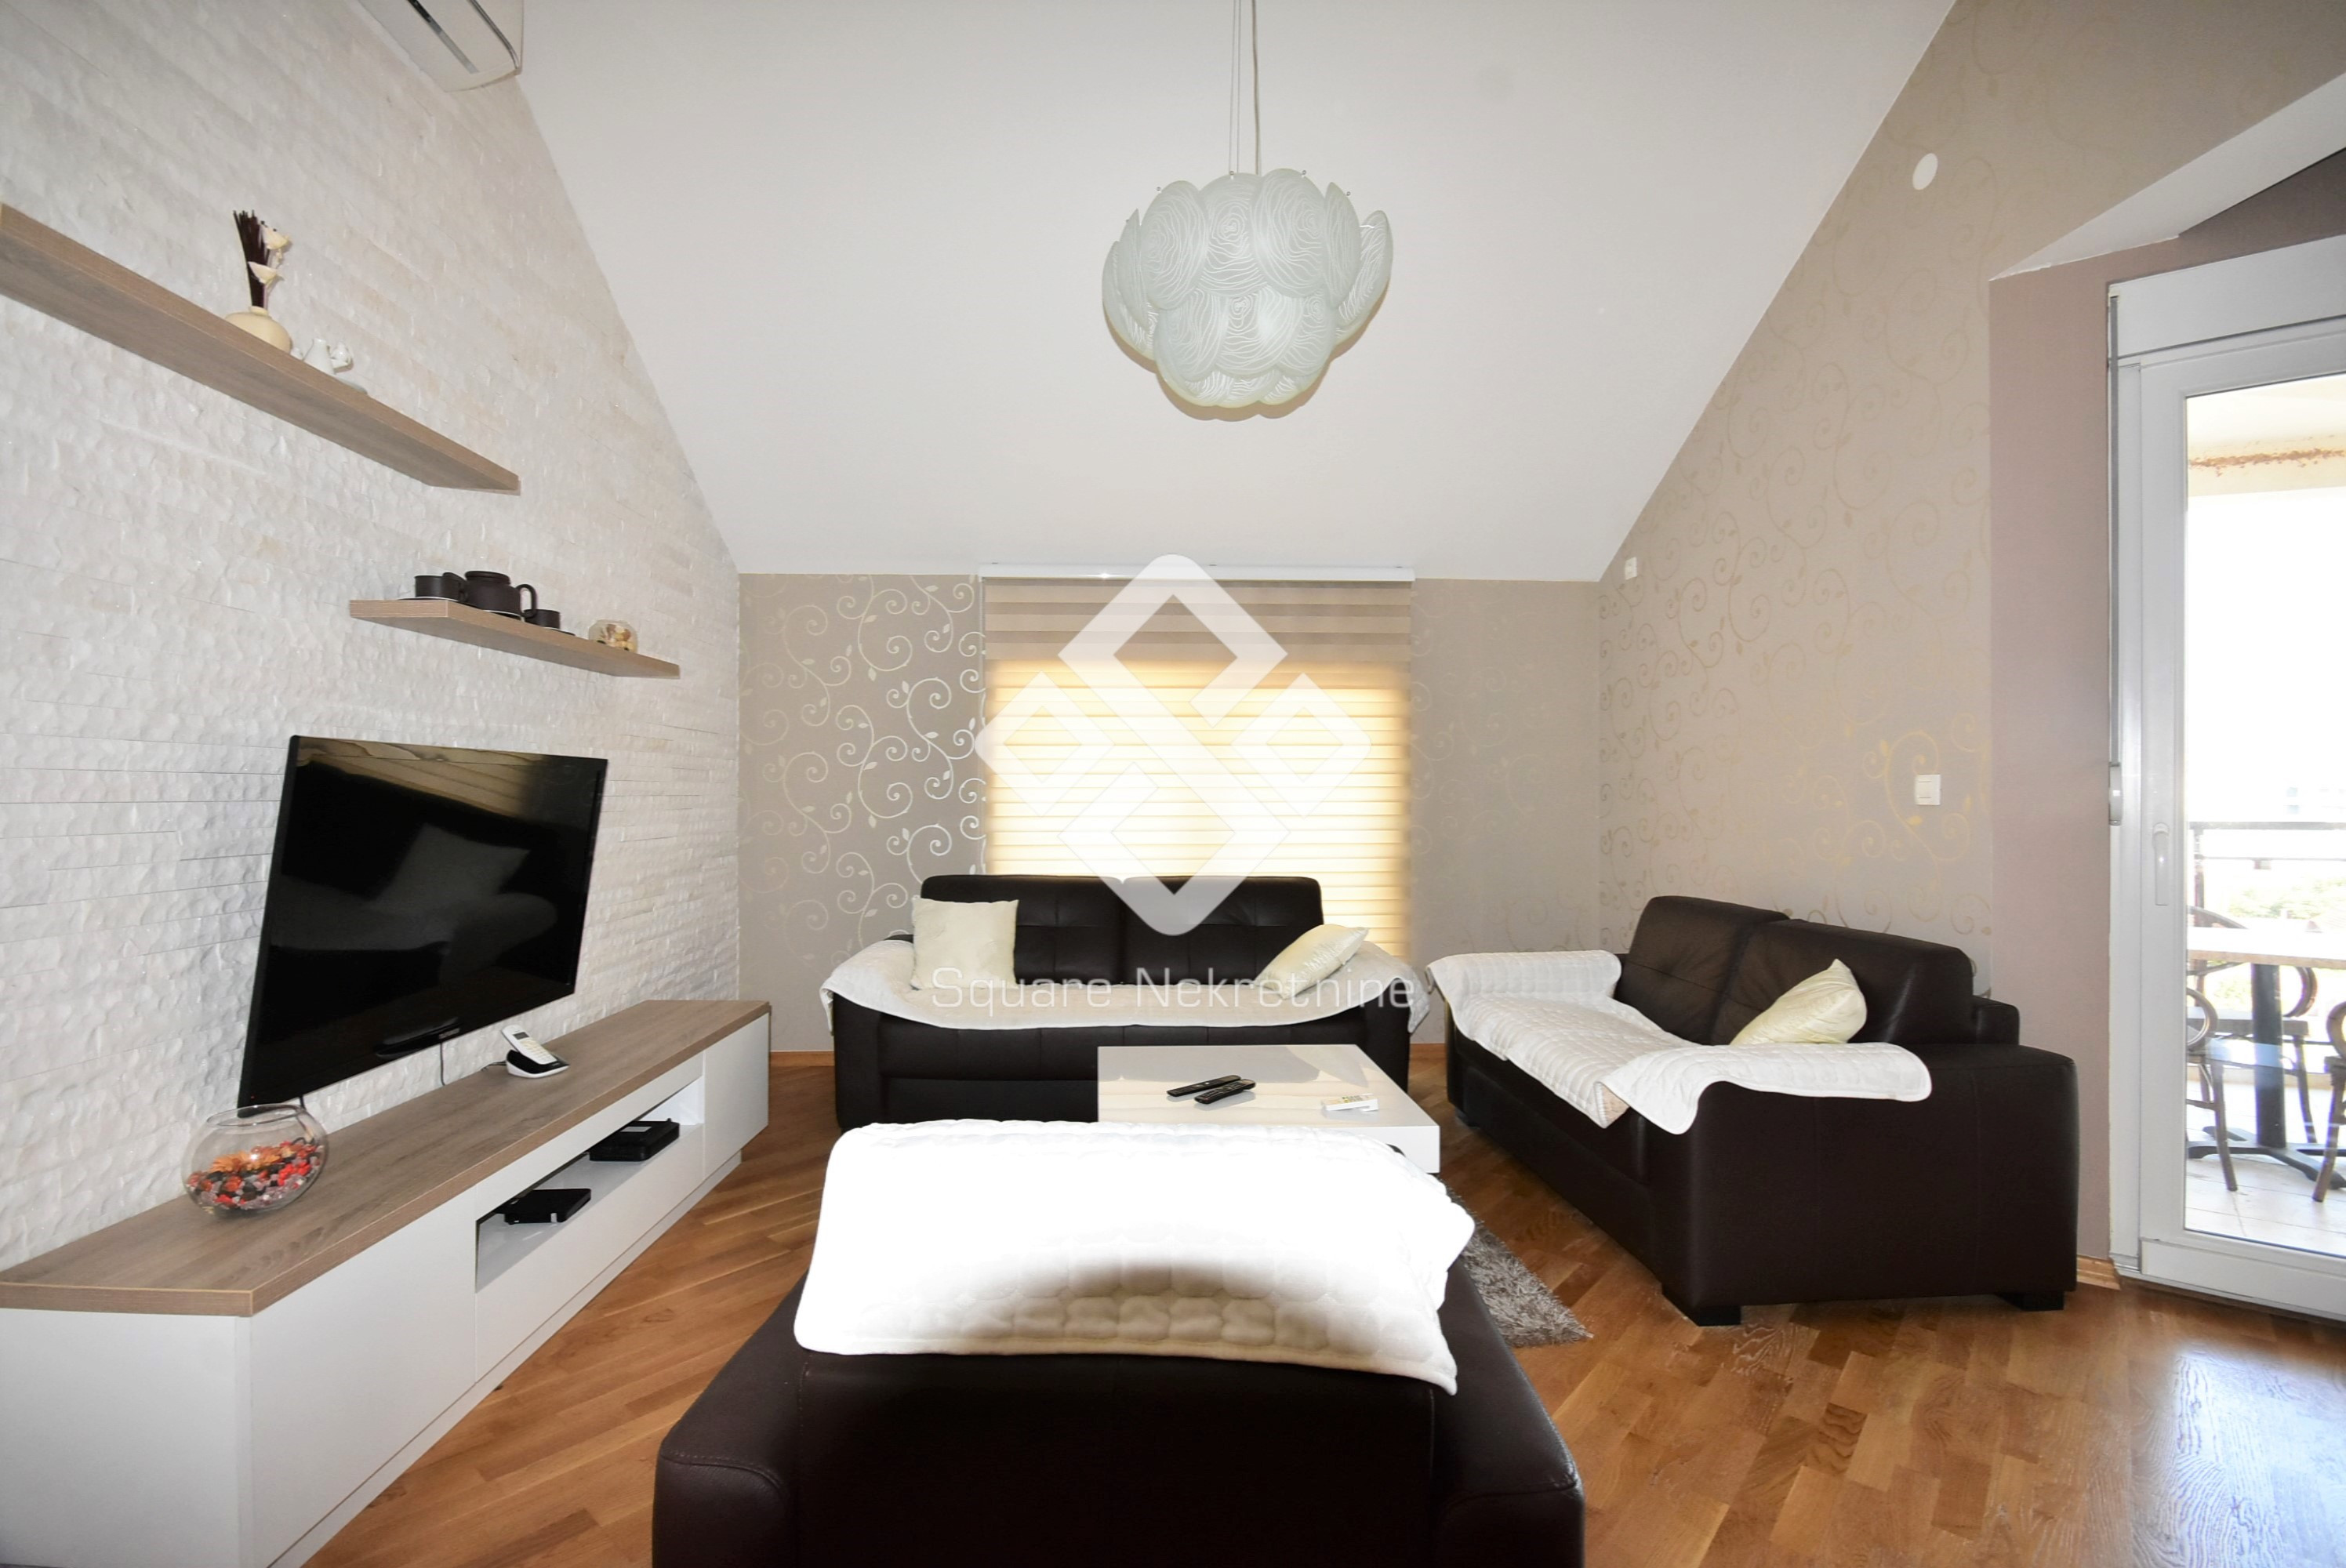 Dvosoban duplex 90m2, namjesten + garaza, Ljubovic